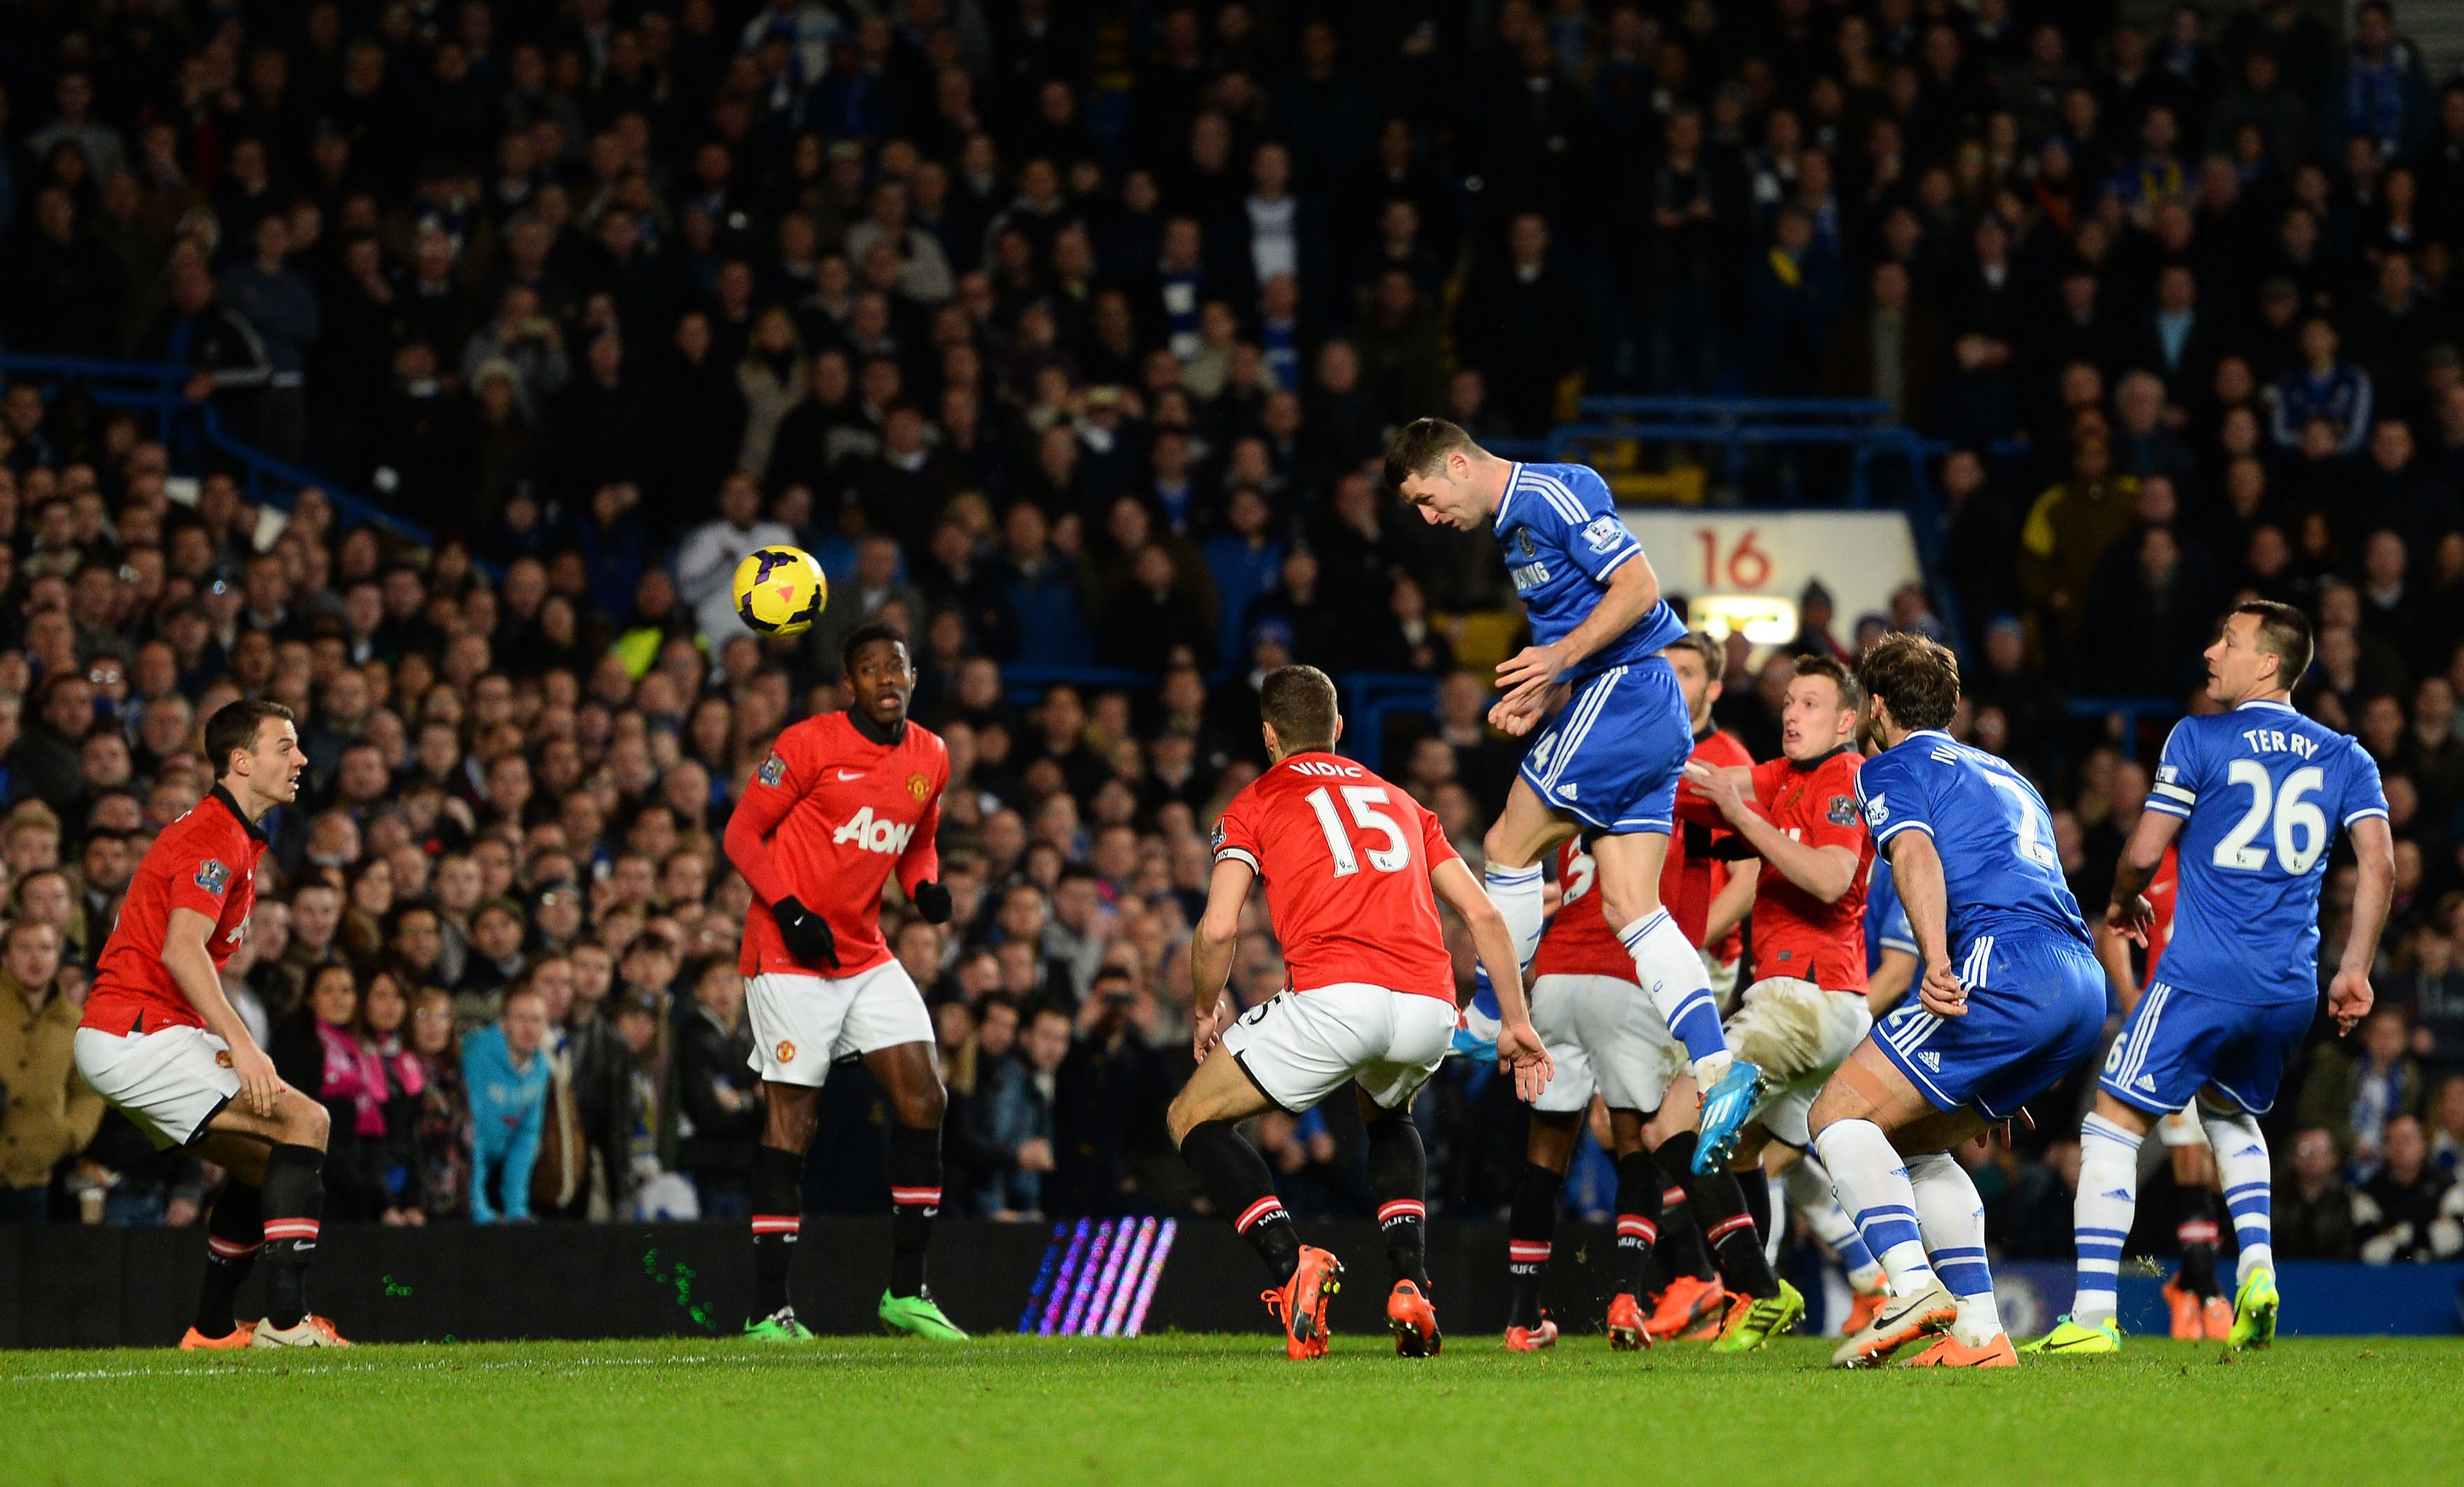 Antonio Contes Chelsea have had the upper hand over Jose Mourinhos Manchester United so far